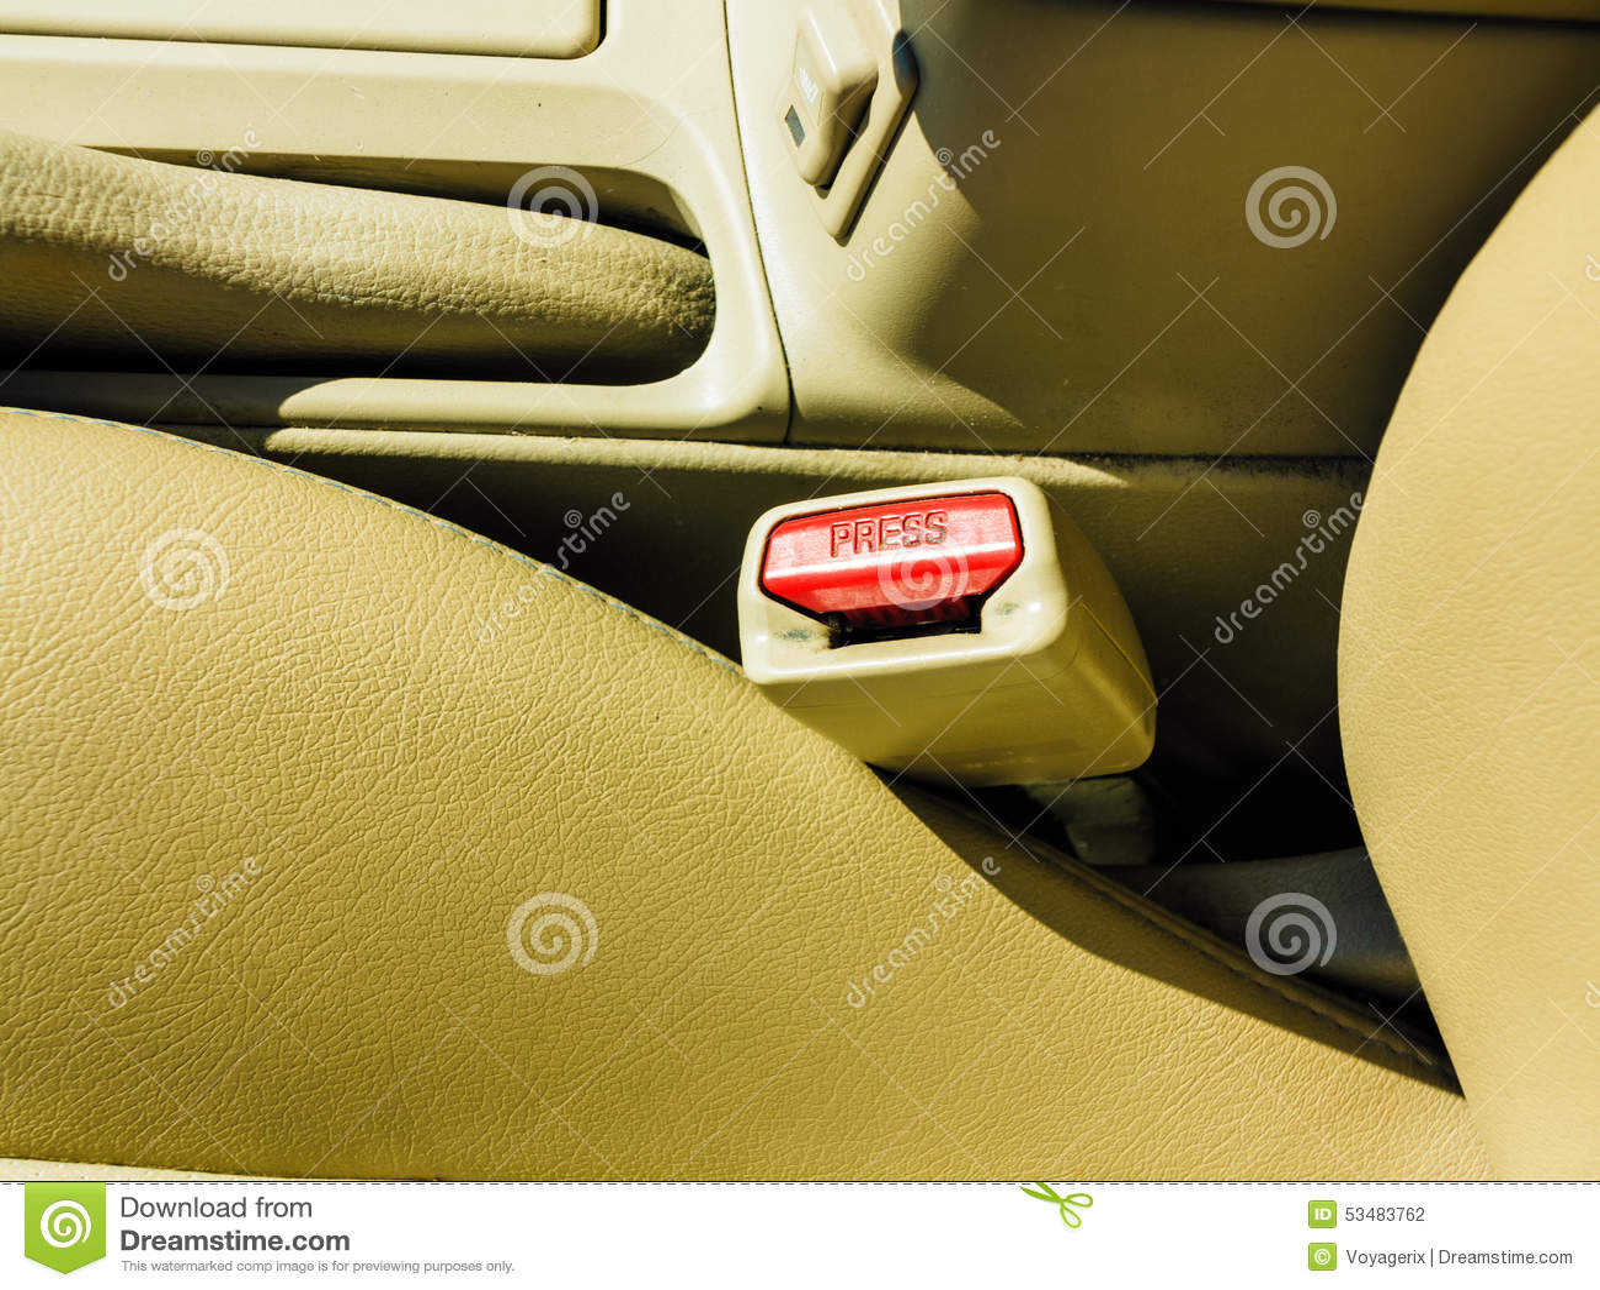 close up fasten the car seat belt stock photography 78715076. Black Bedroom Furniture Sets. Home Design Ideas